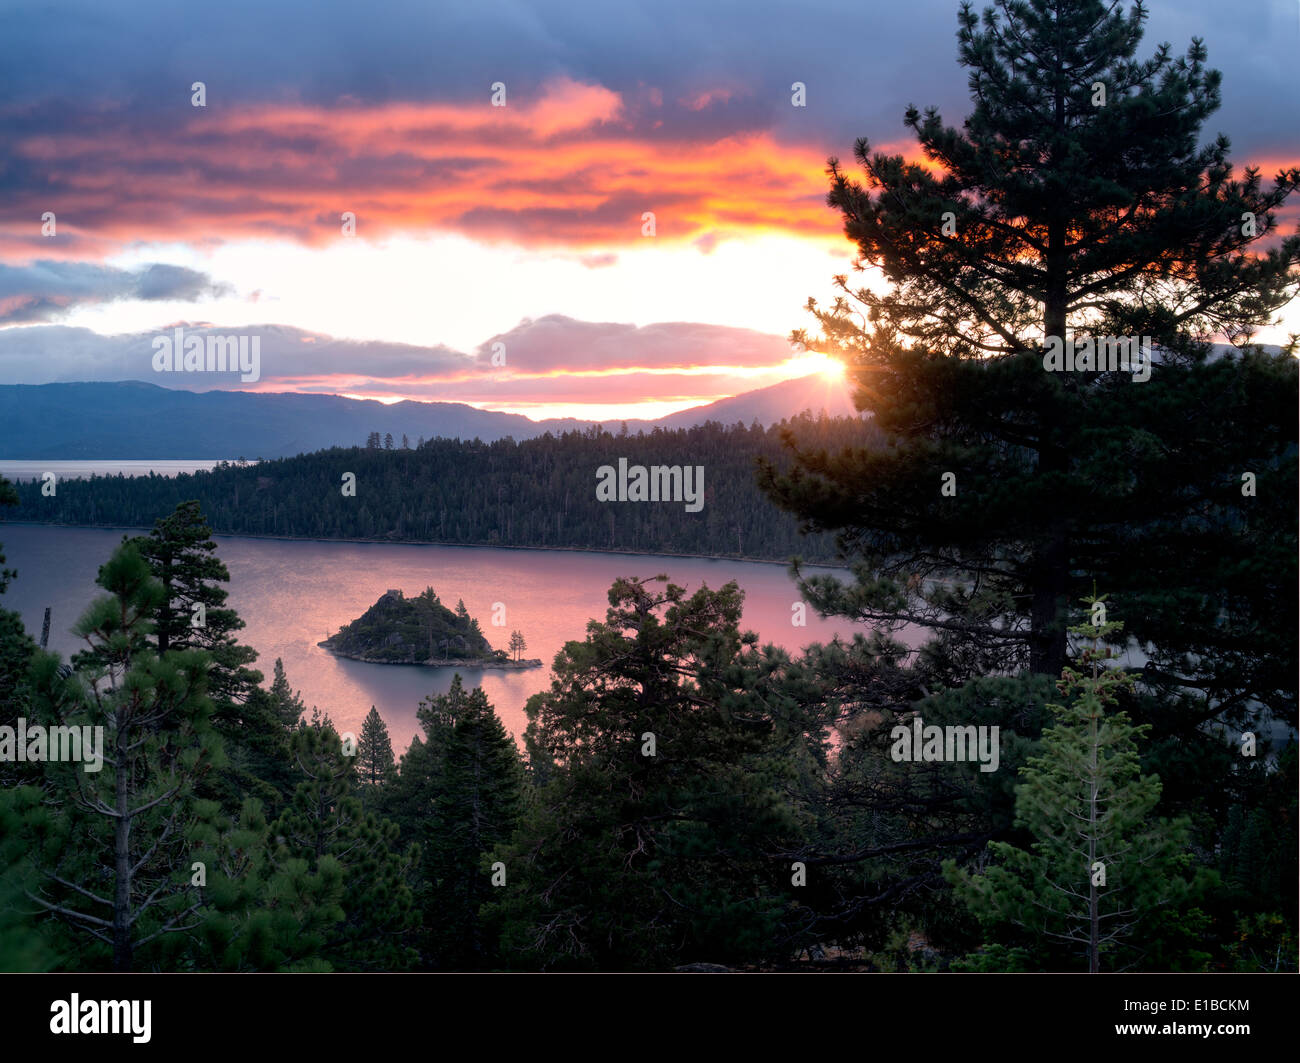 Sunrise over Emerald Bay with Fannette Island, Lake Tahoe, California. - Stock Image